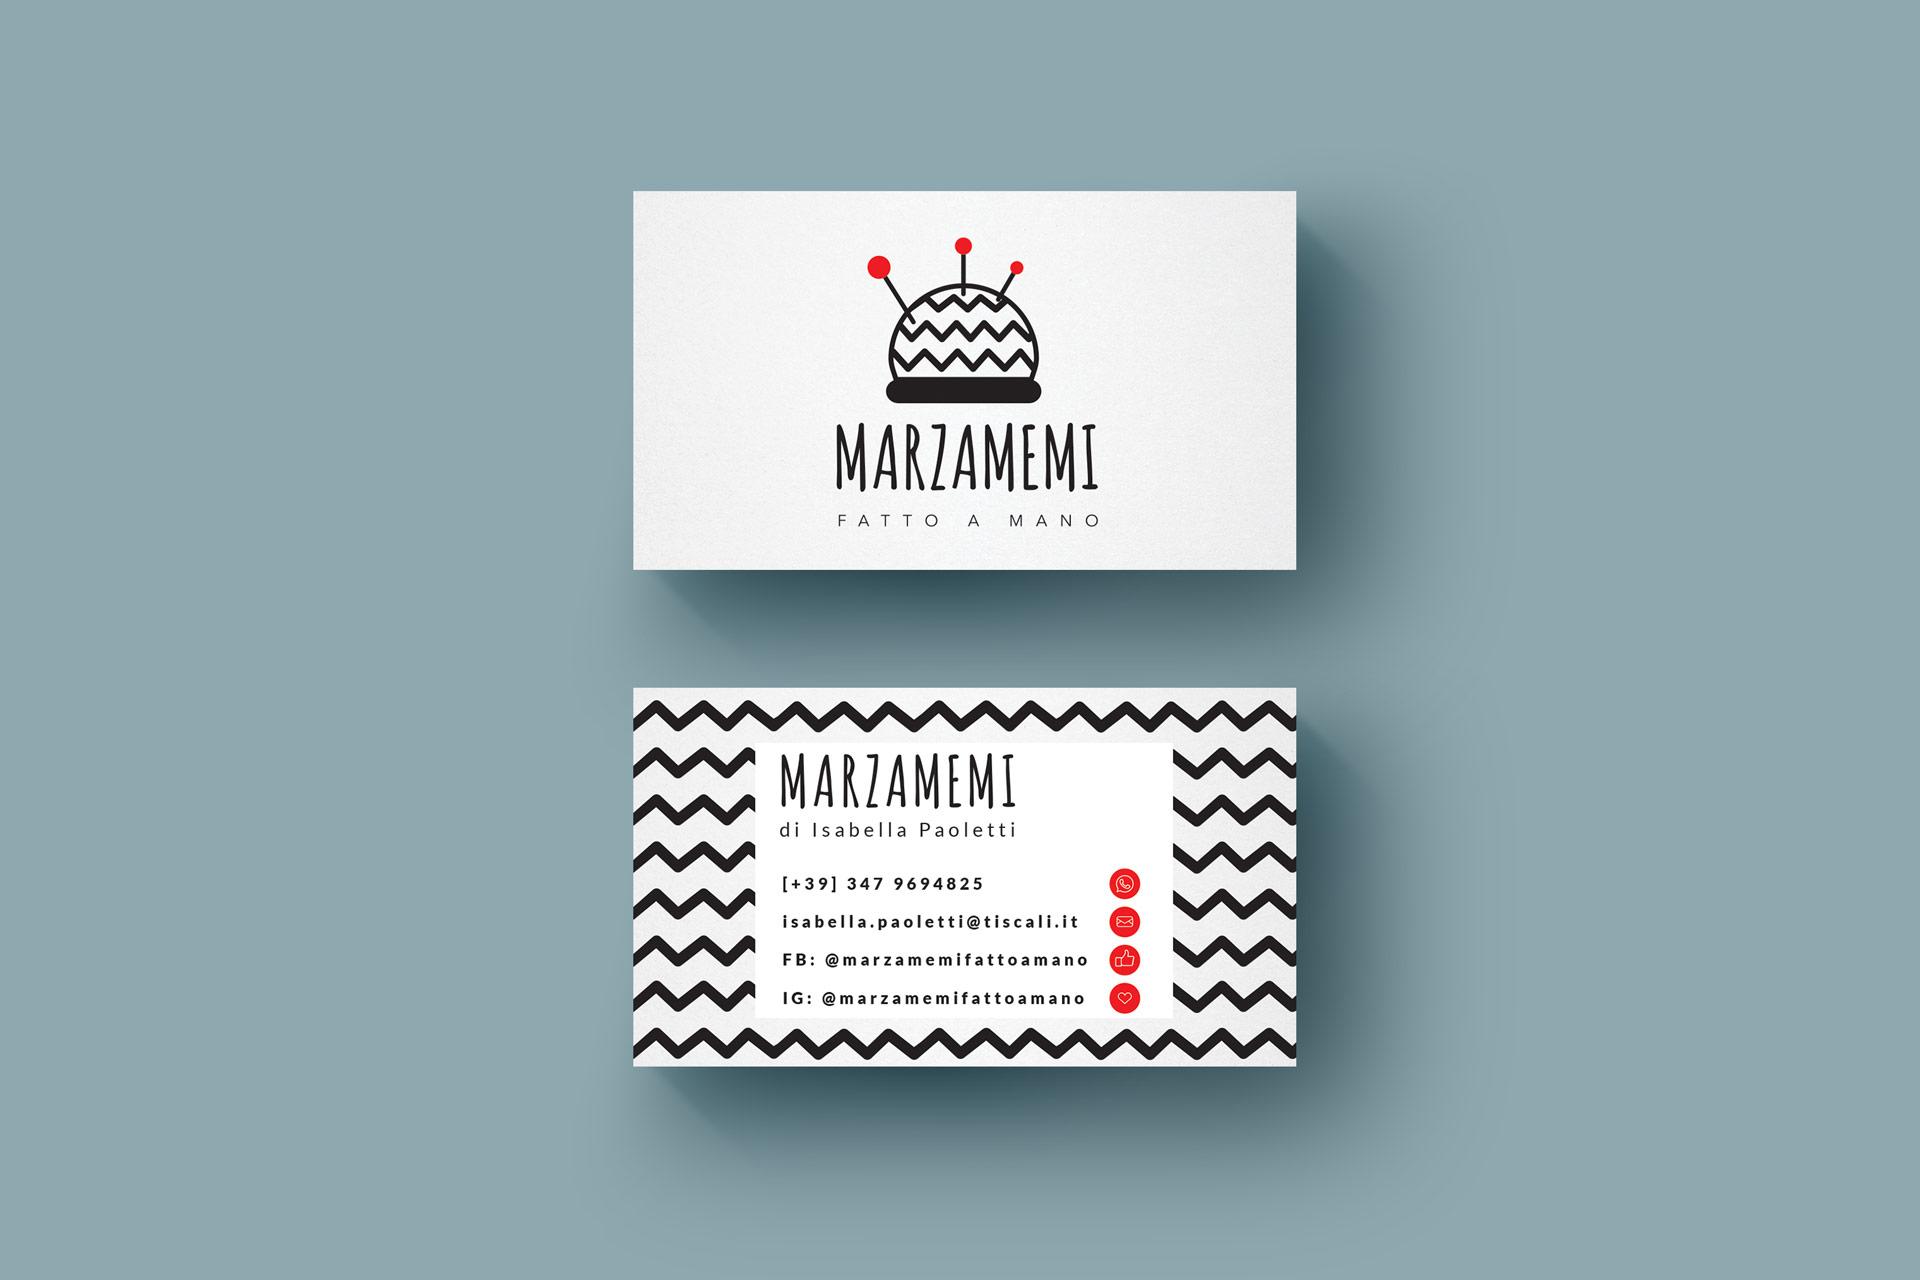 Marzamemi business cards